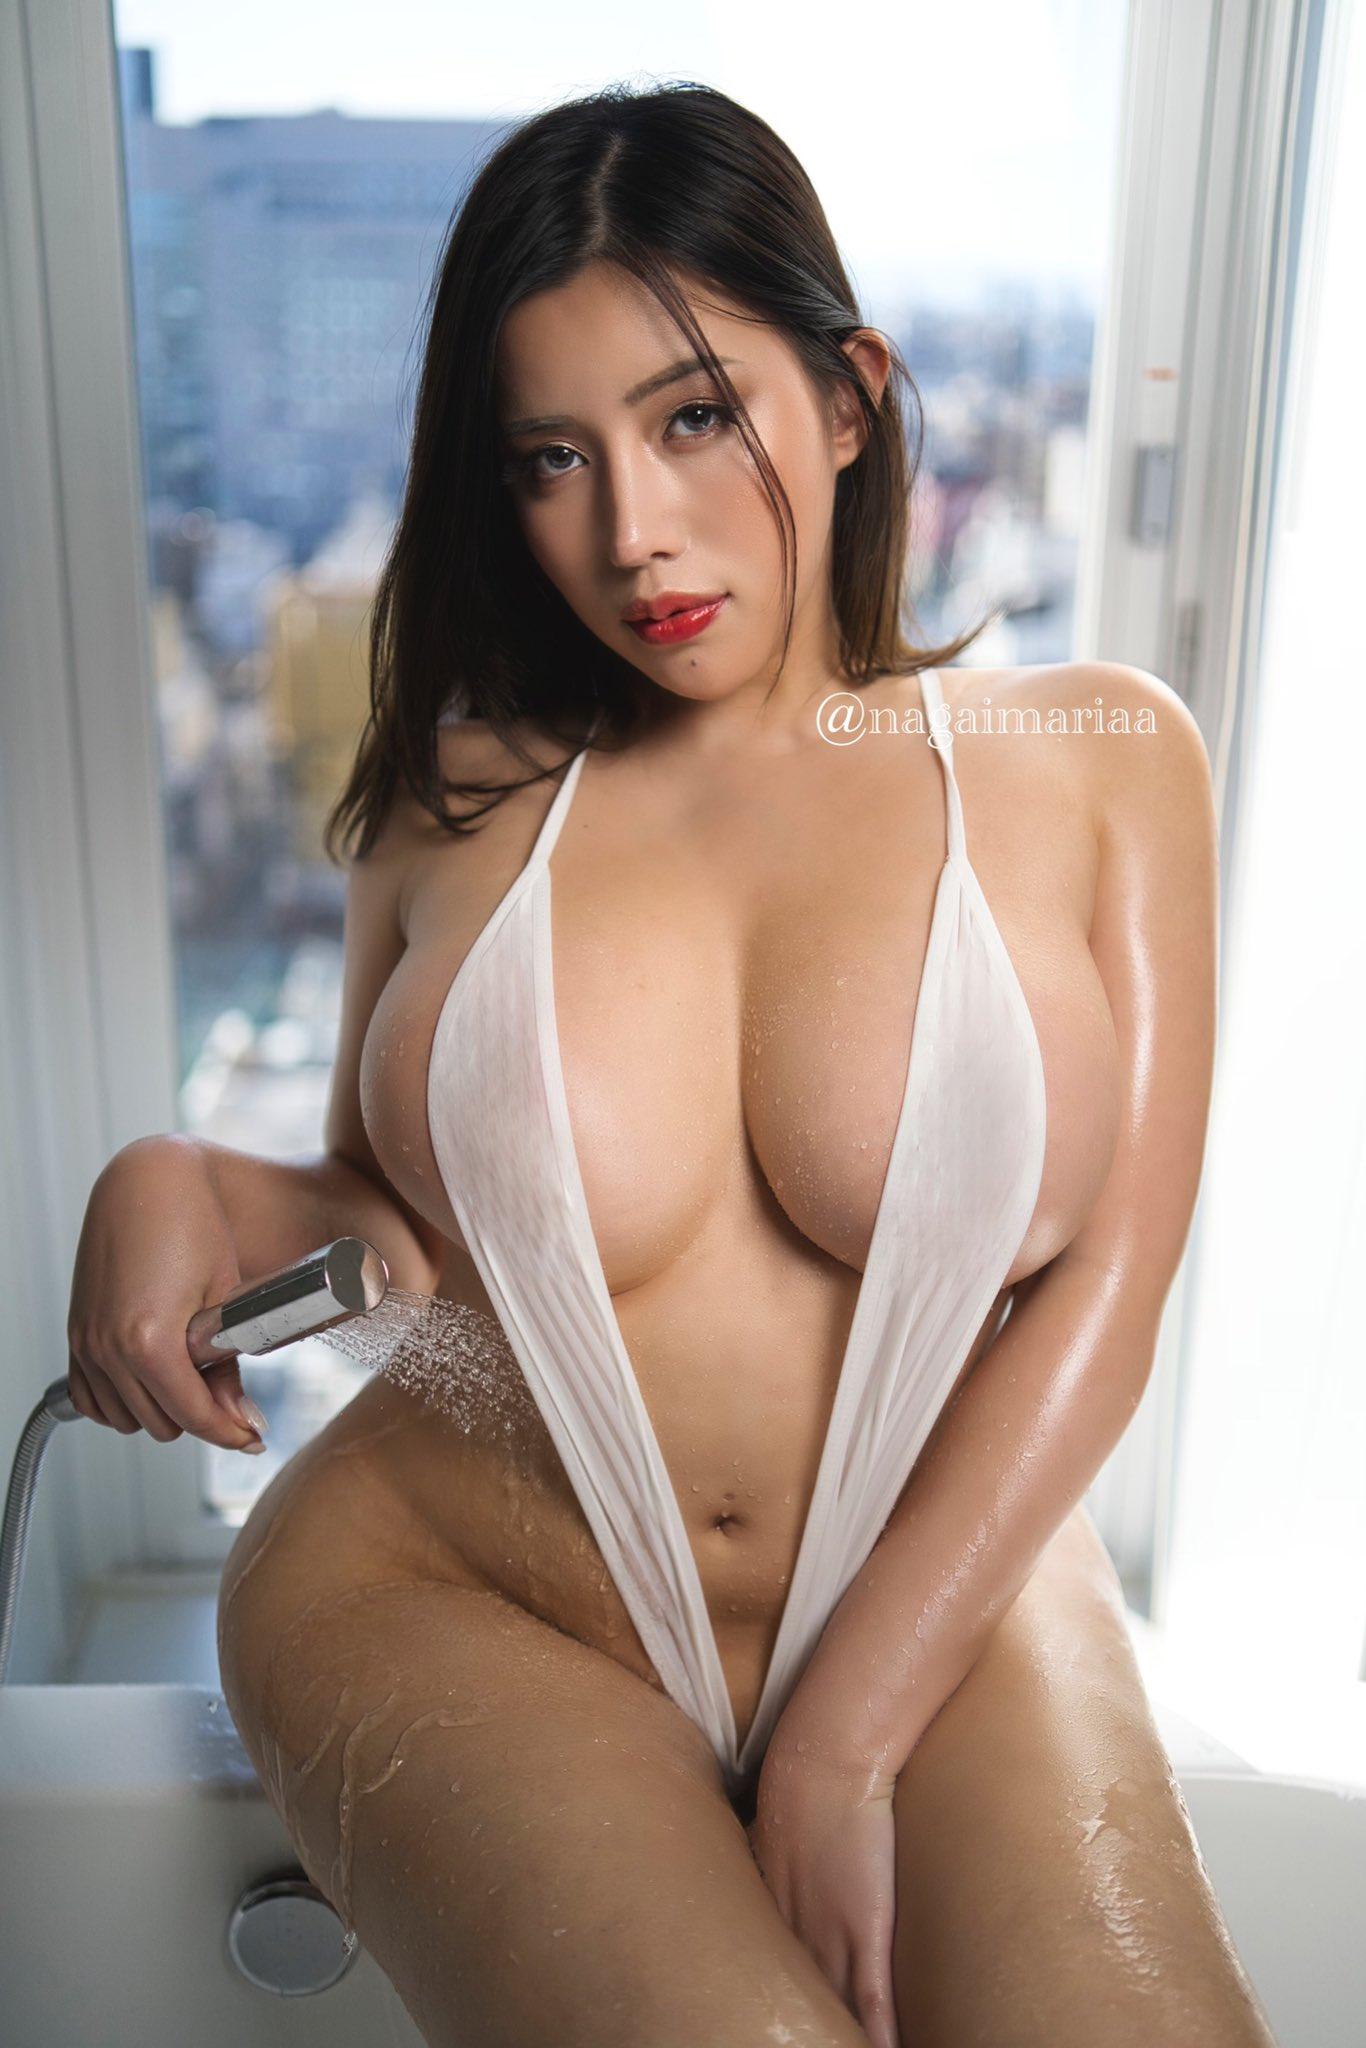 Nagai Maria Nude Leaked (3 Videos + 136 Photos) 333